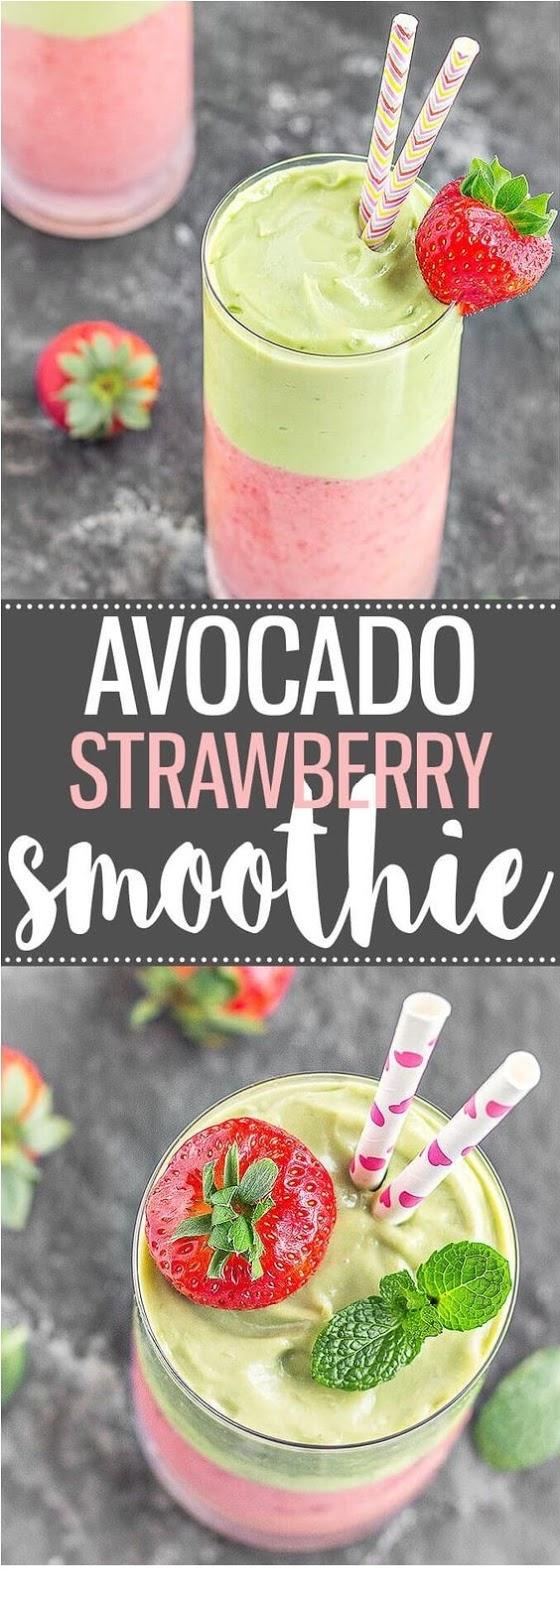 Avocado Strawberry Layered Smoothie